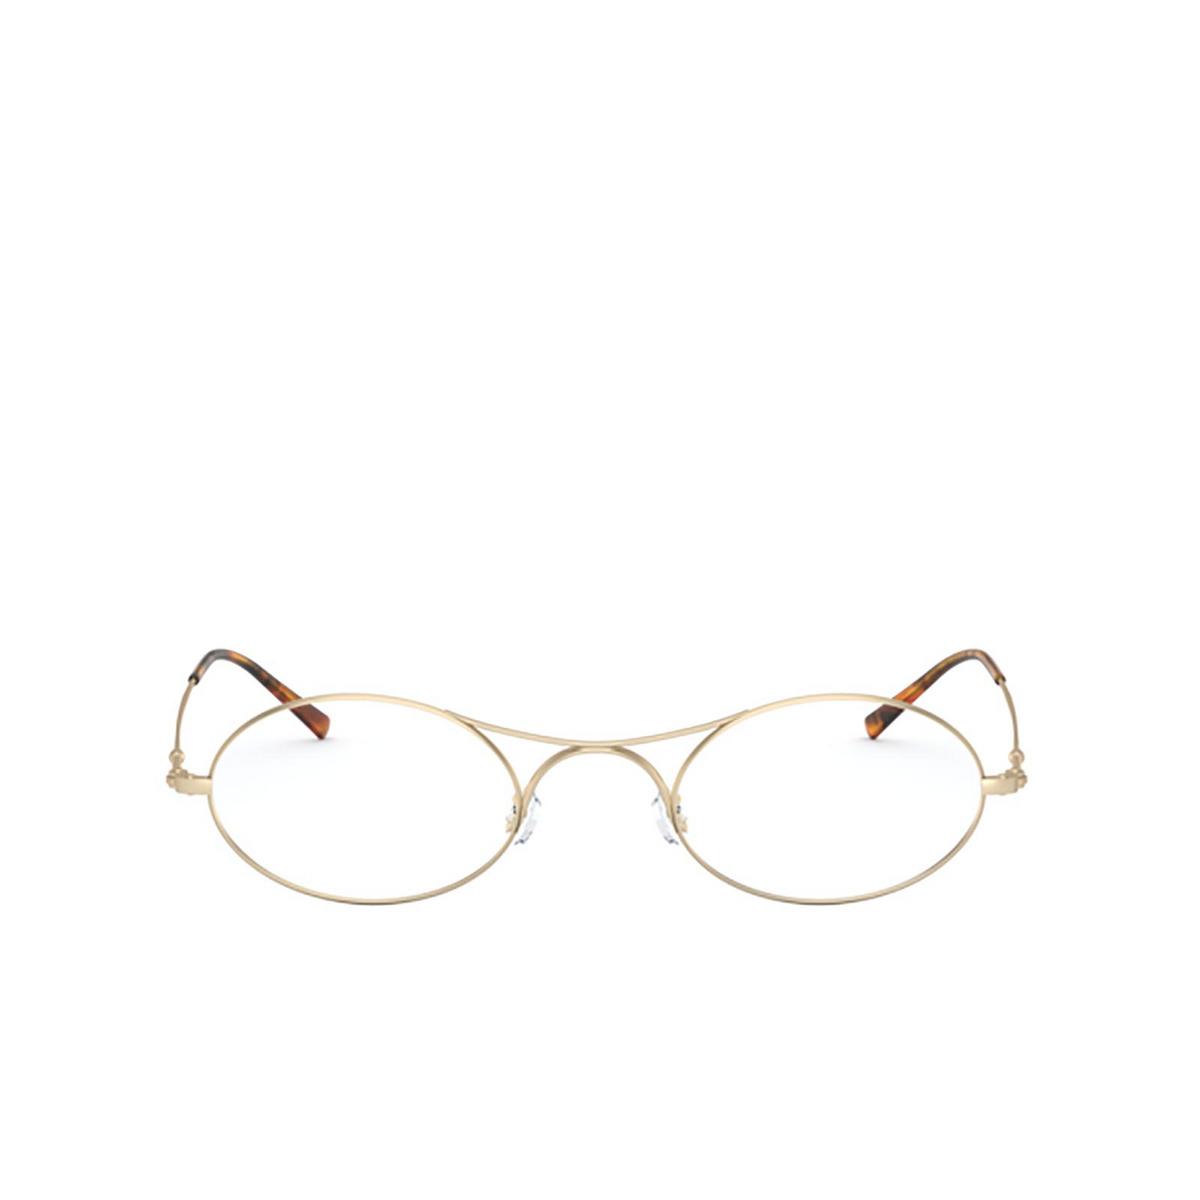 Giorgio Armani® Oval Eyeglasses: AR 229M color Matte Pale Gold 3002 - front view.